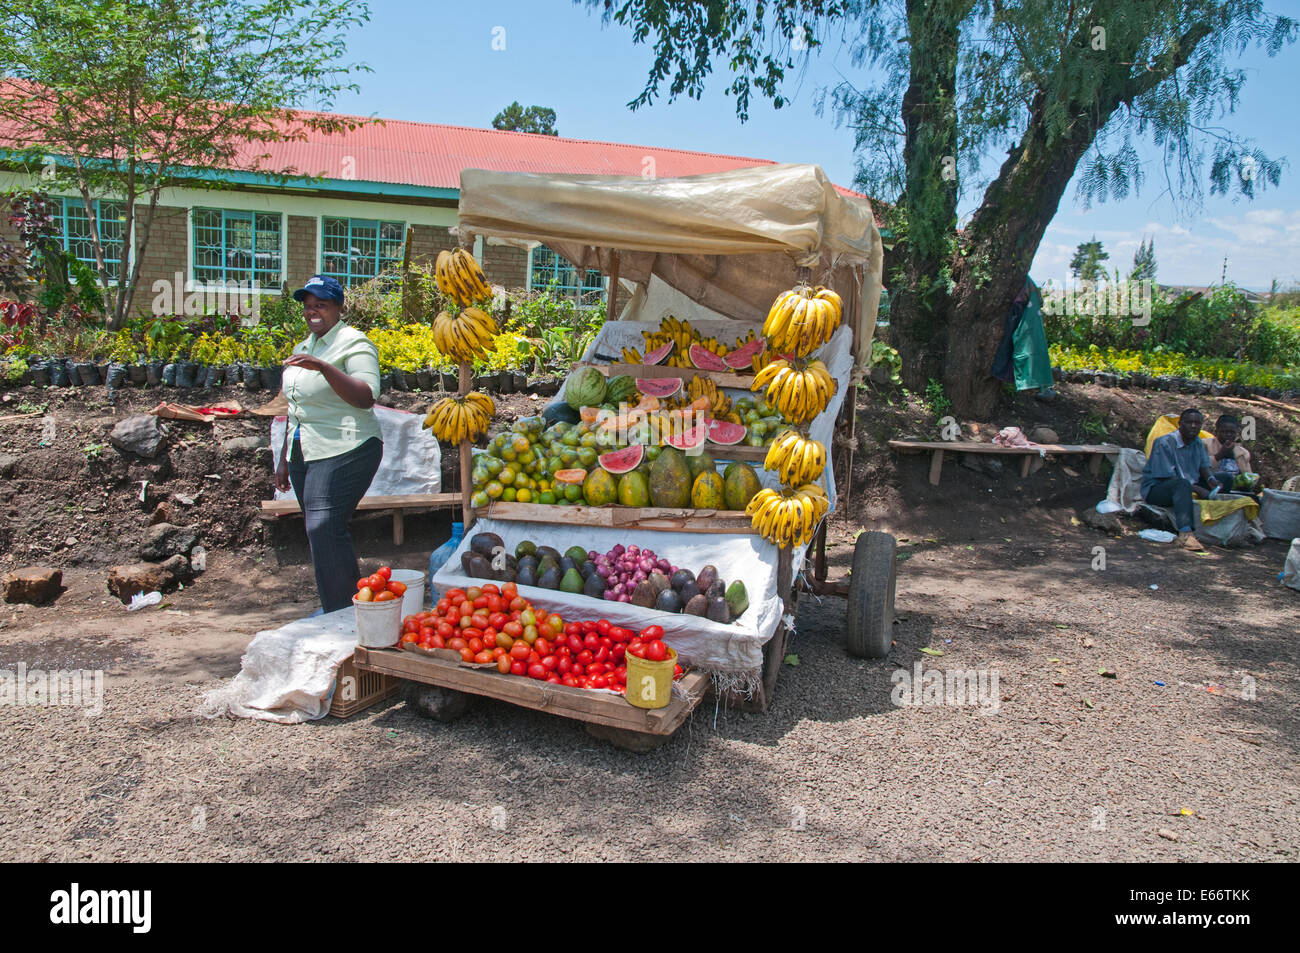 Woman at side of her market stall selling fruit bananas melons papaya avocados tomatoes on outskirts of Nakuru town - Stock Image